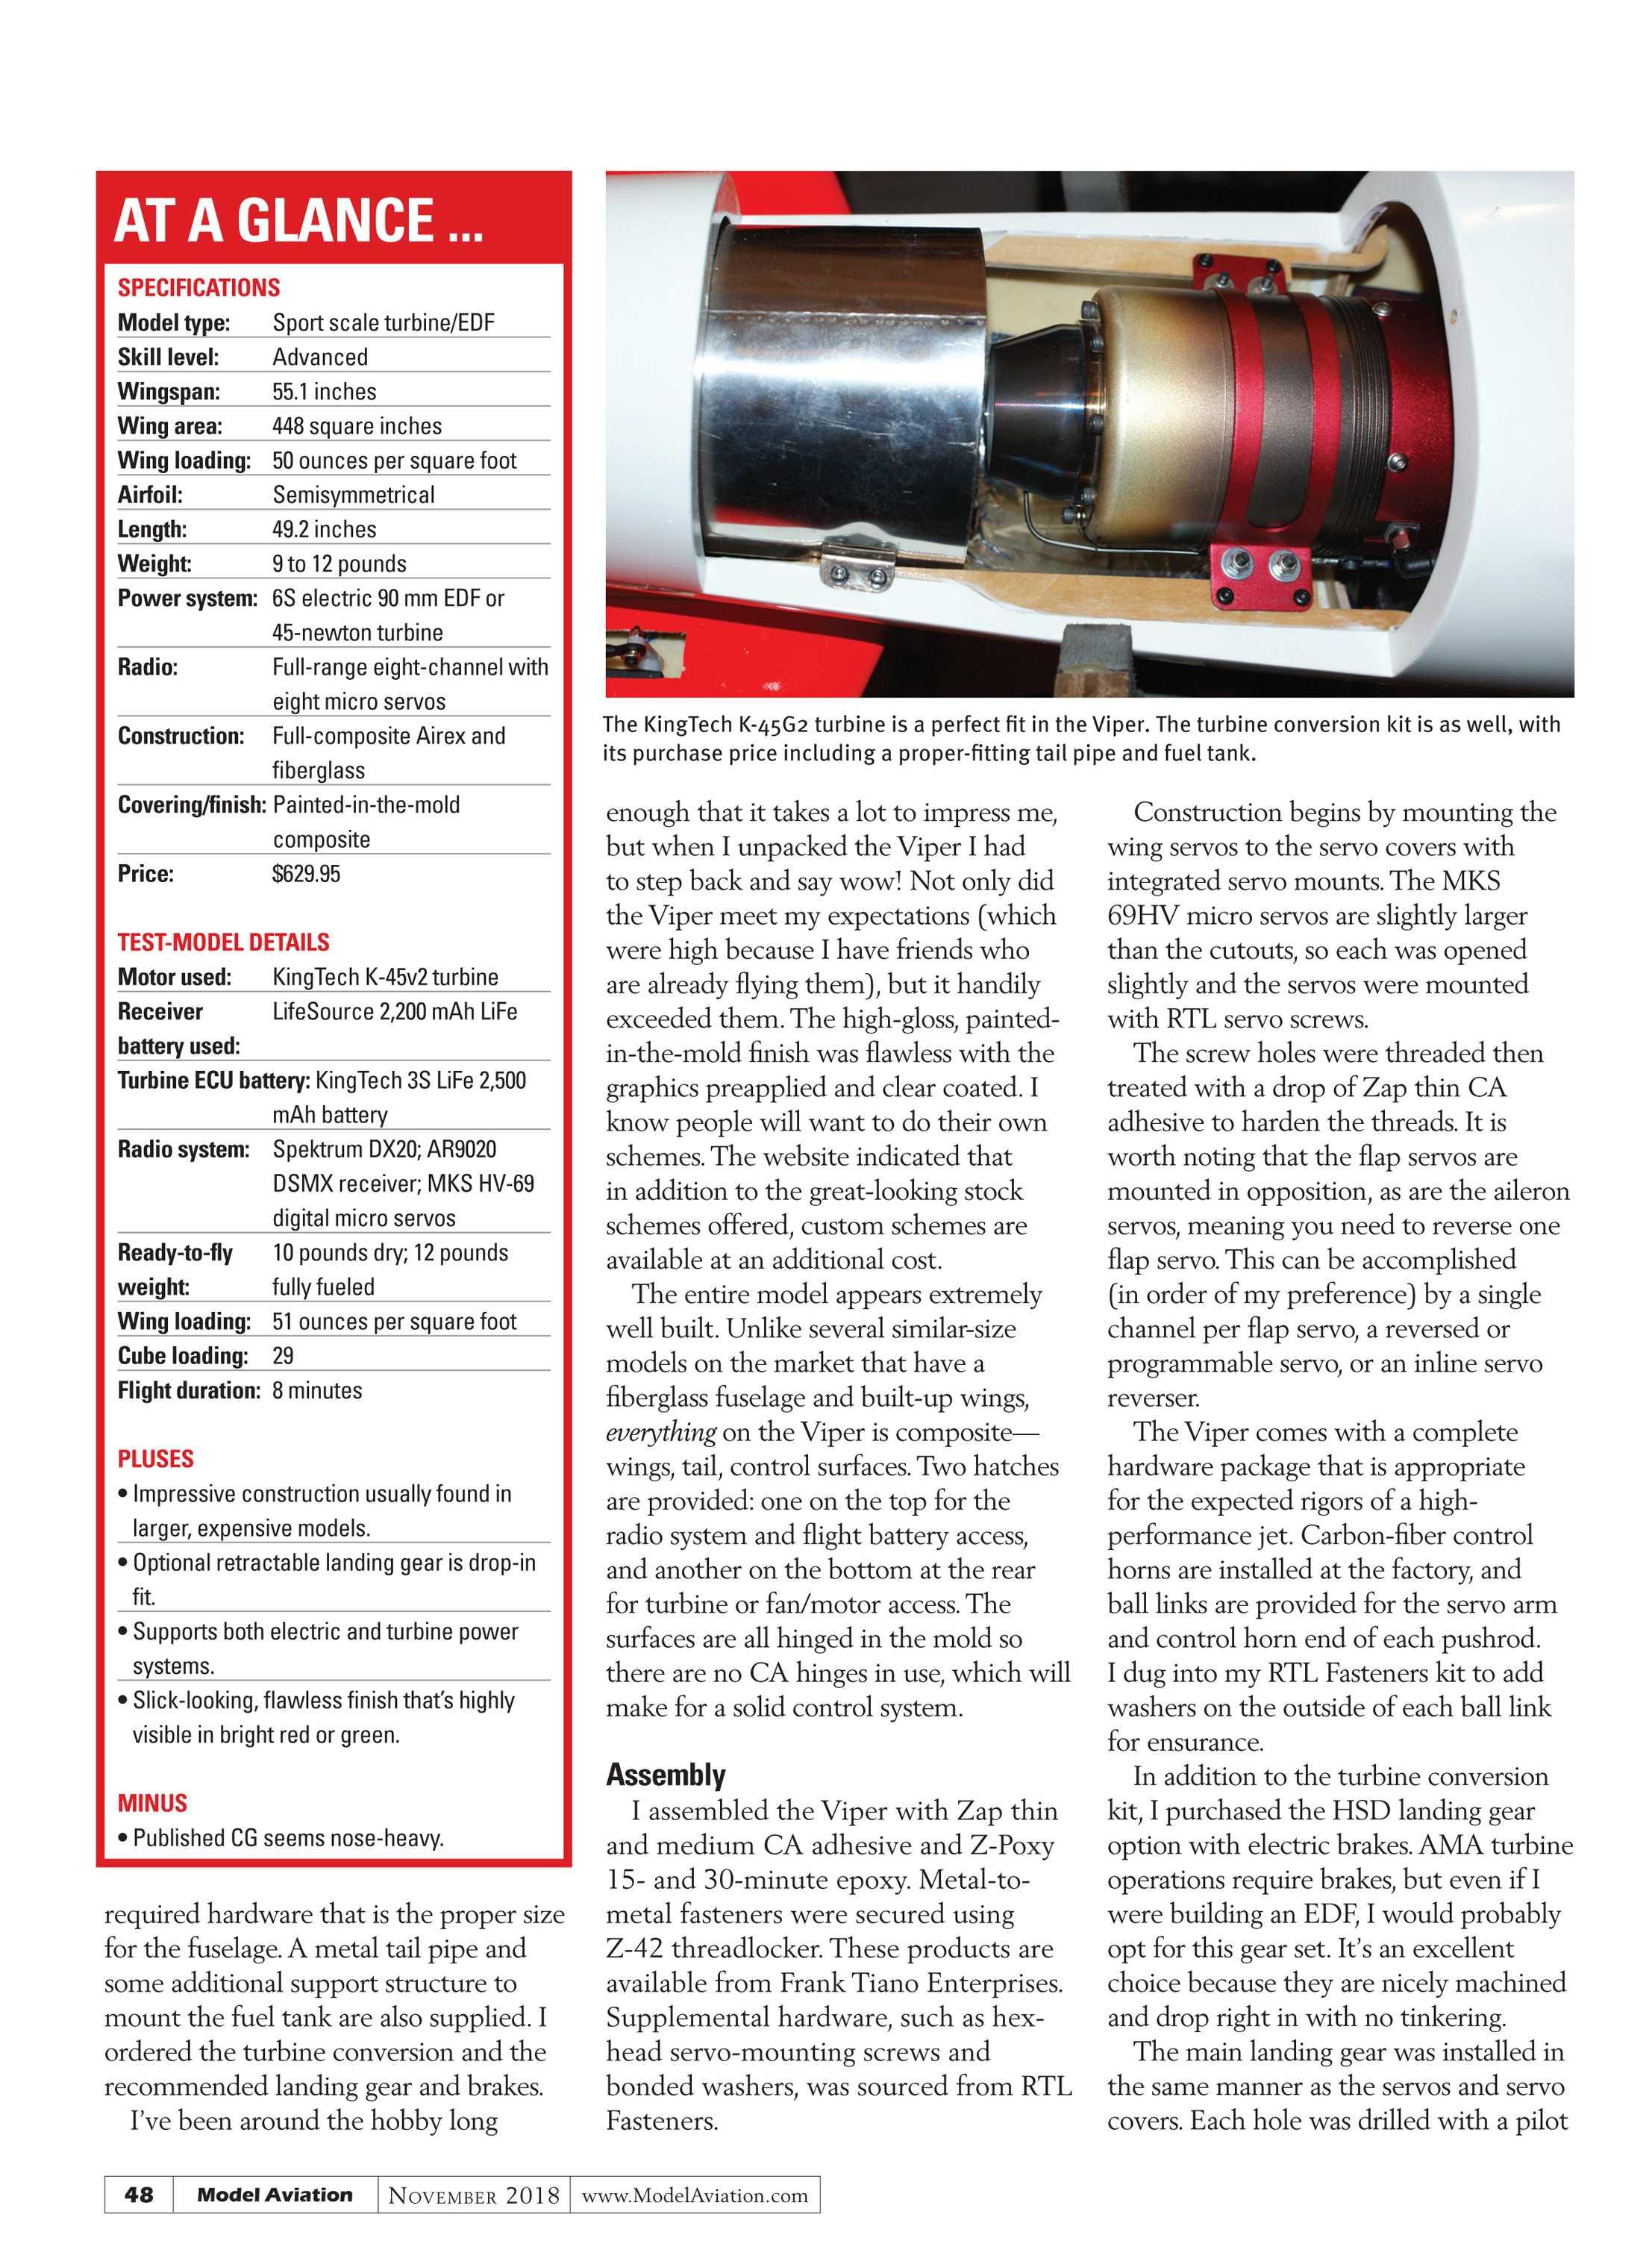 Model Aviation - November 2018 - page 47